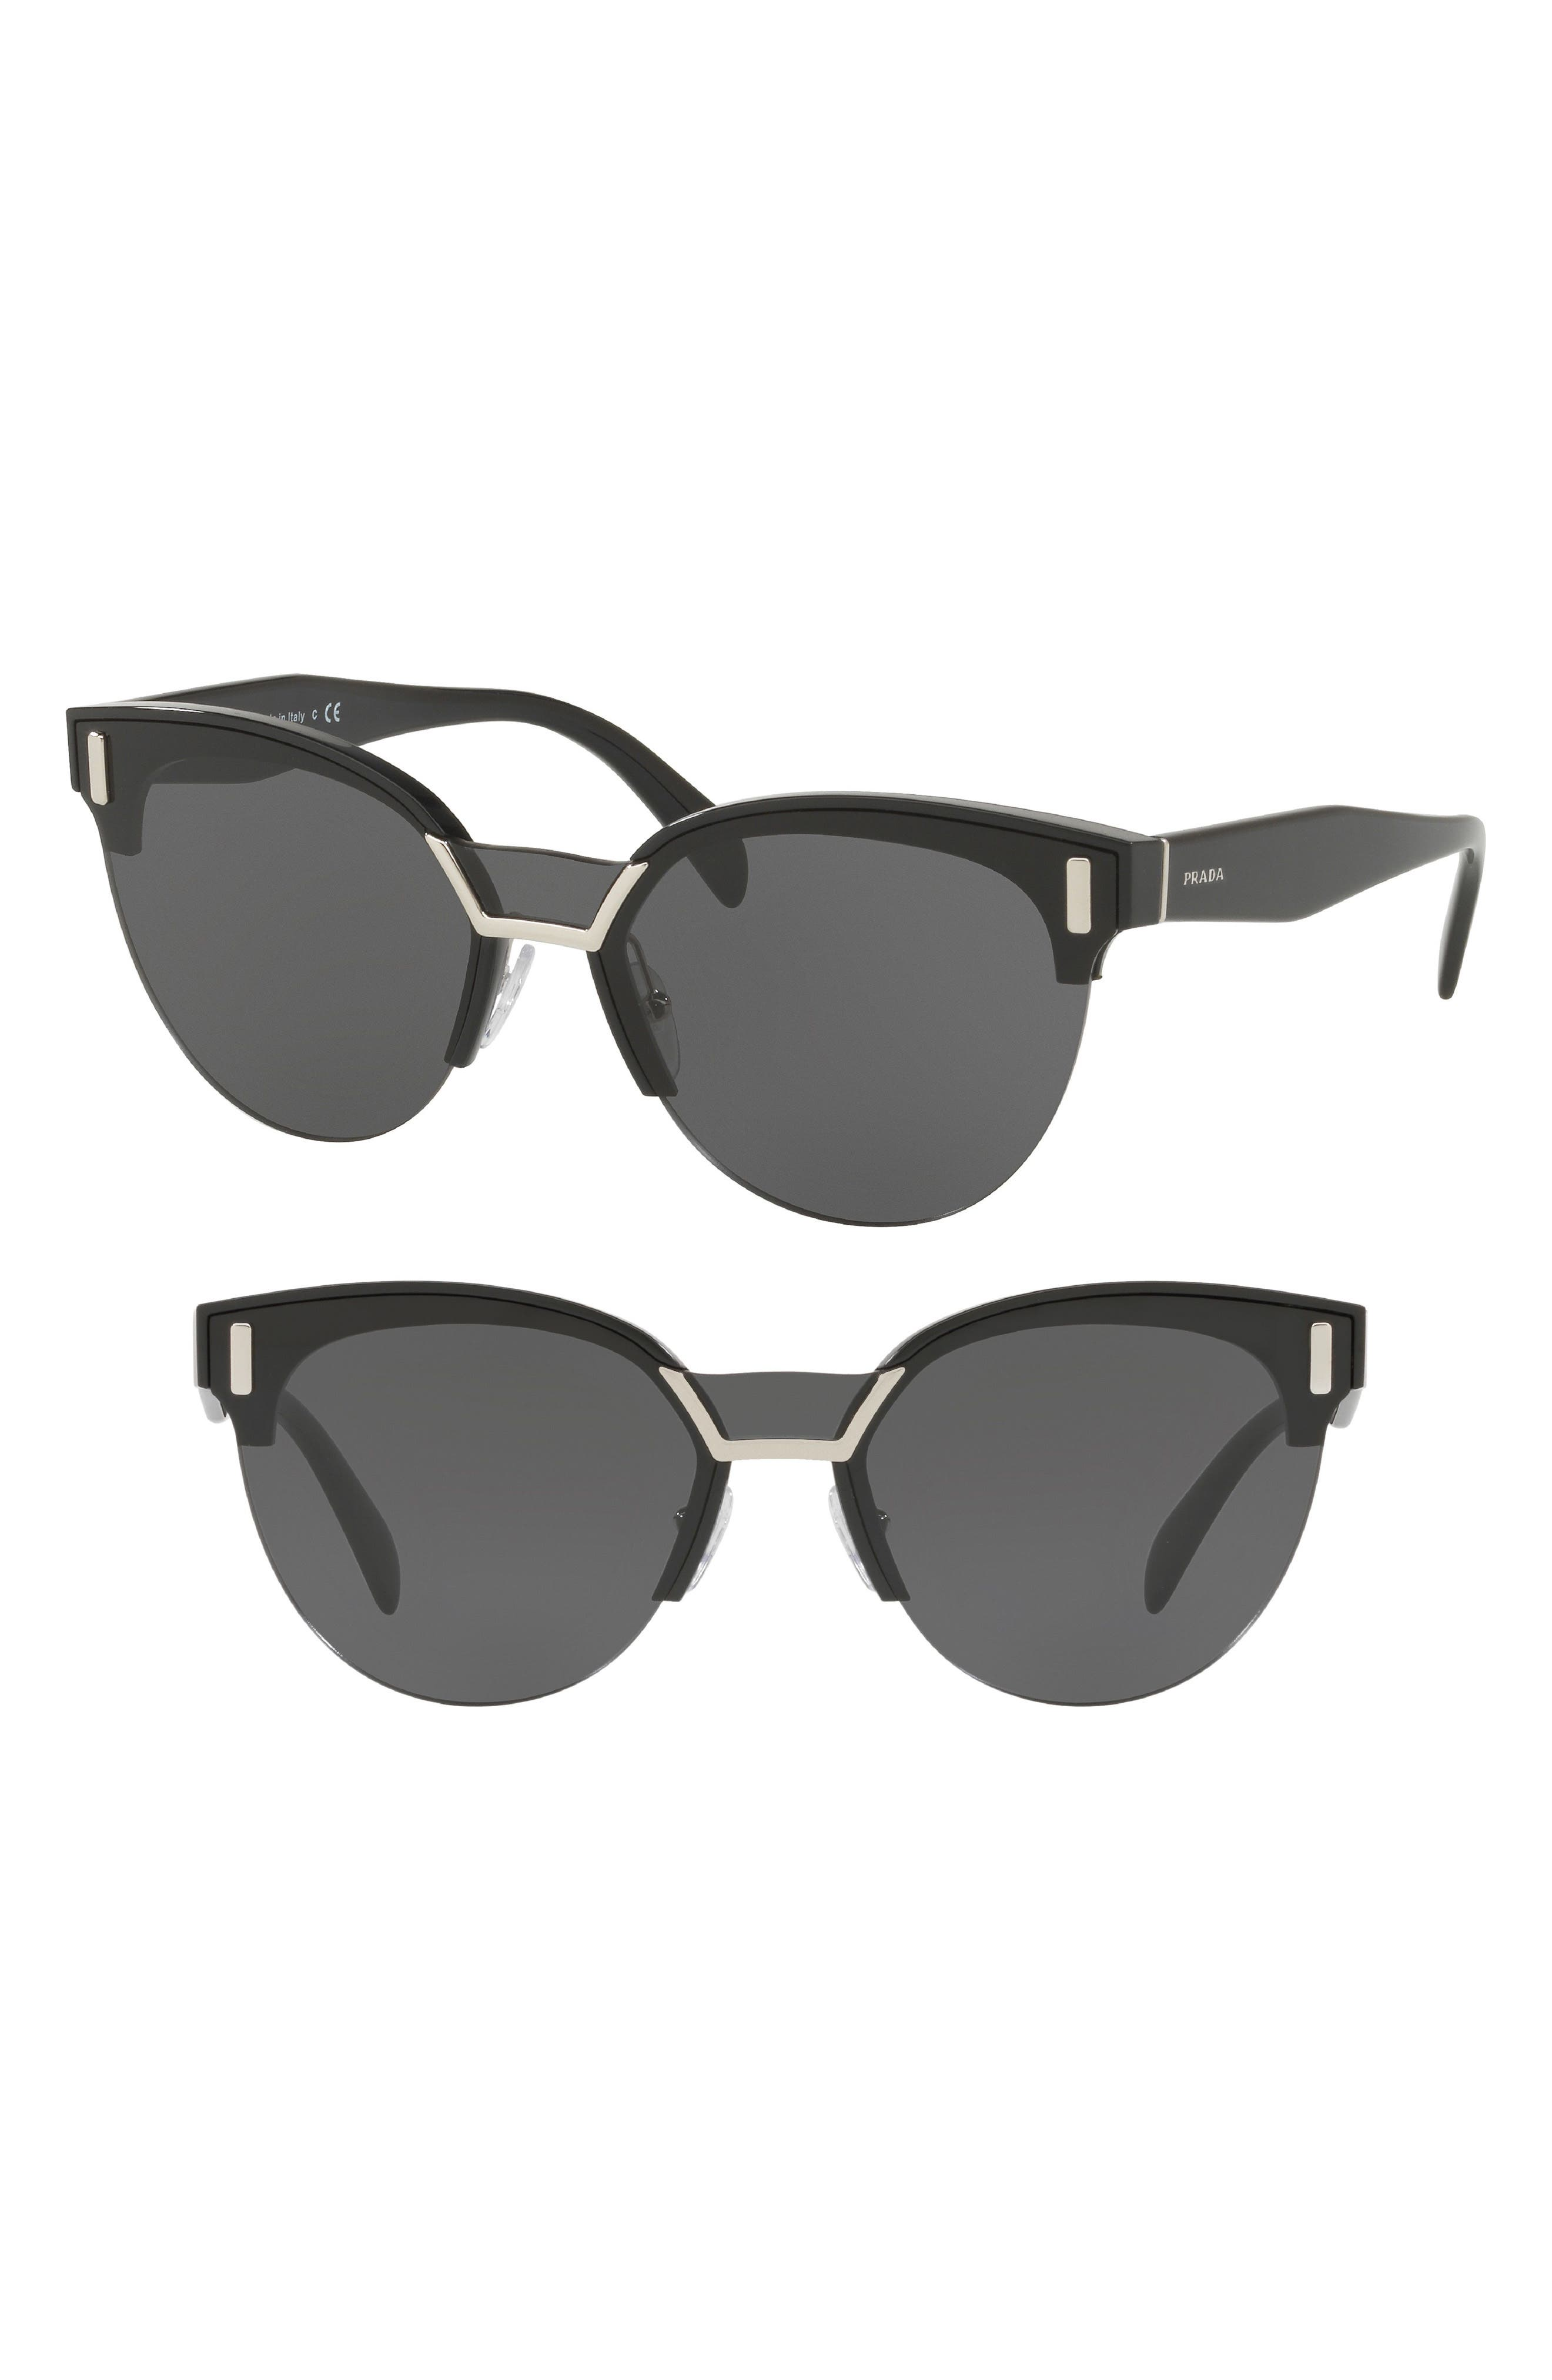 50mm Angular Sunglasses,                         Main,                         color, 001